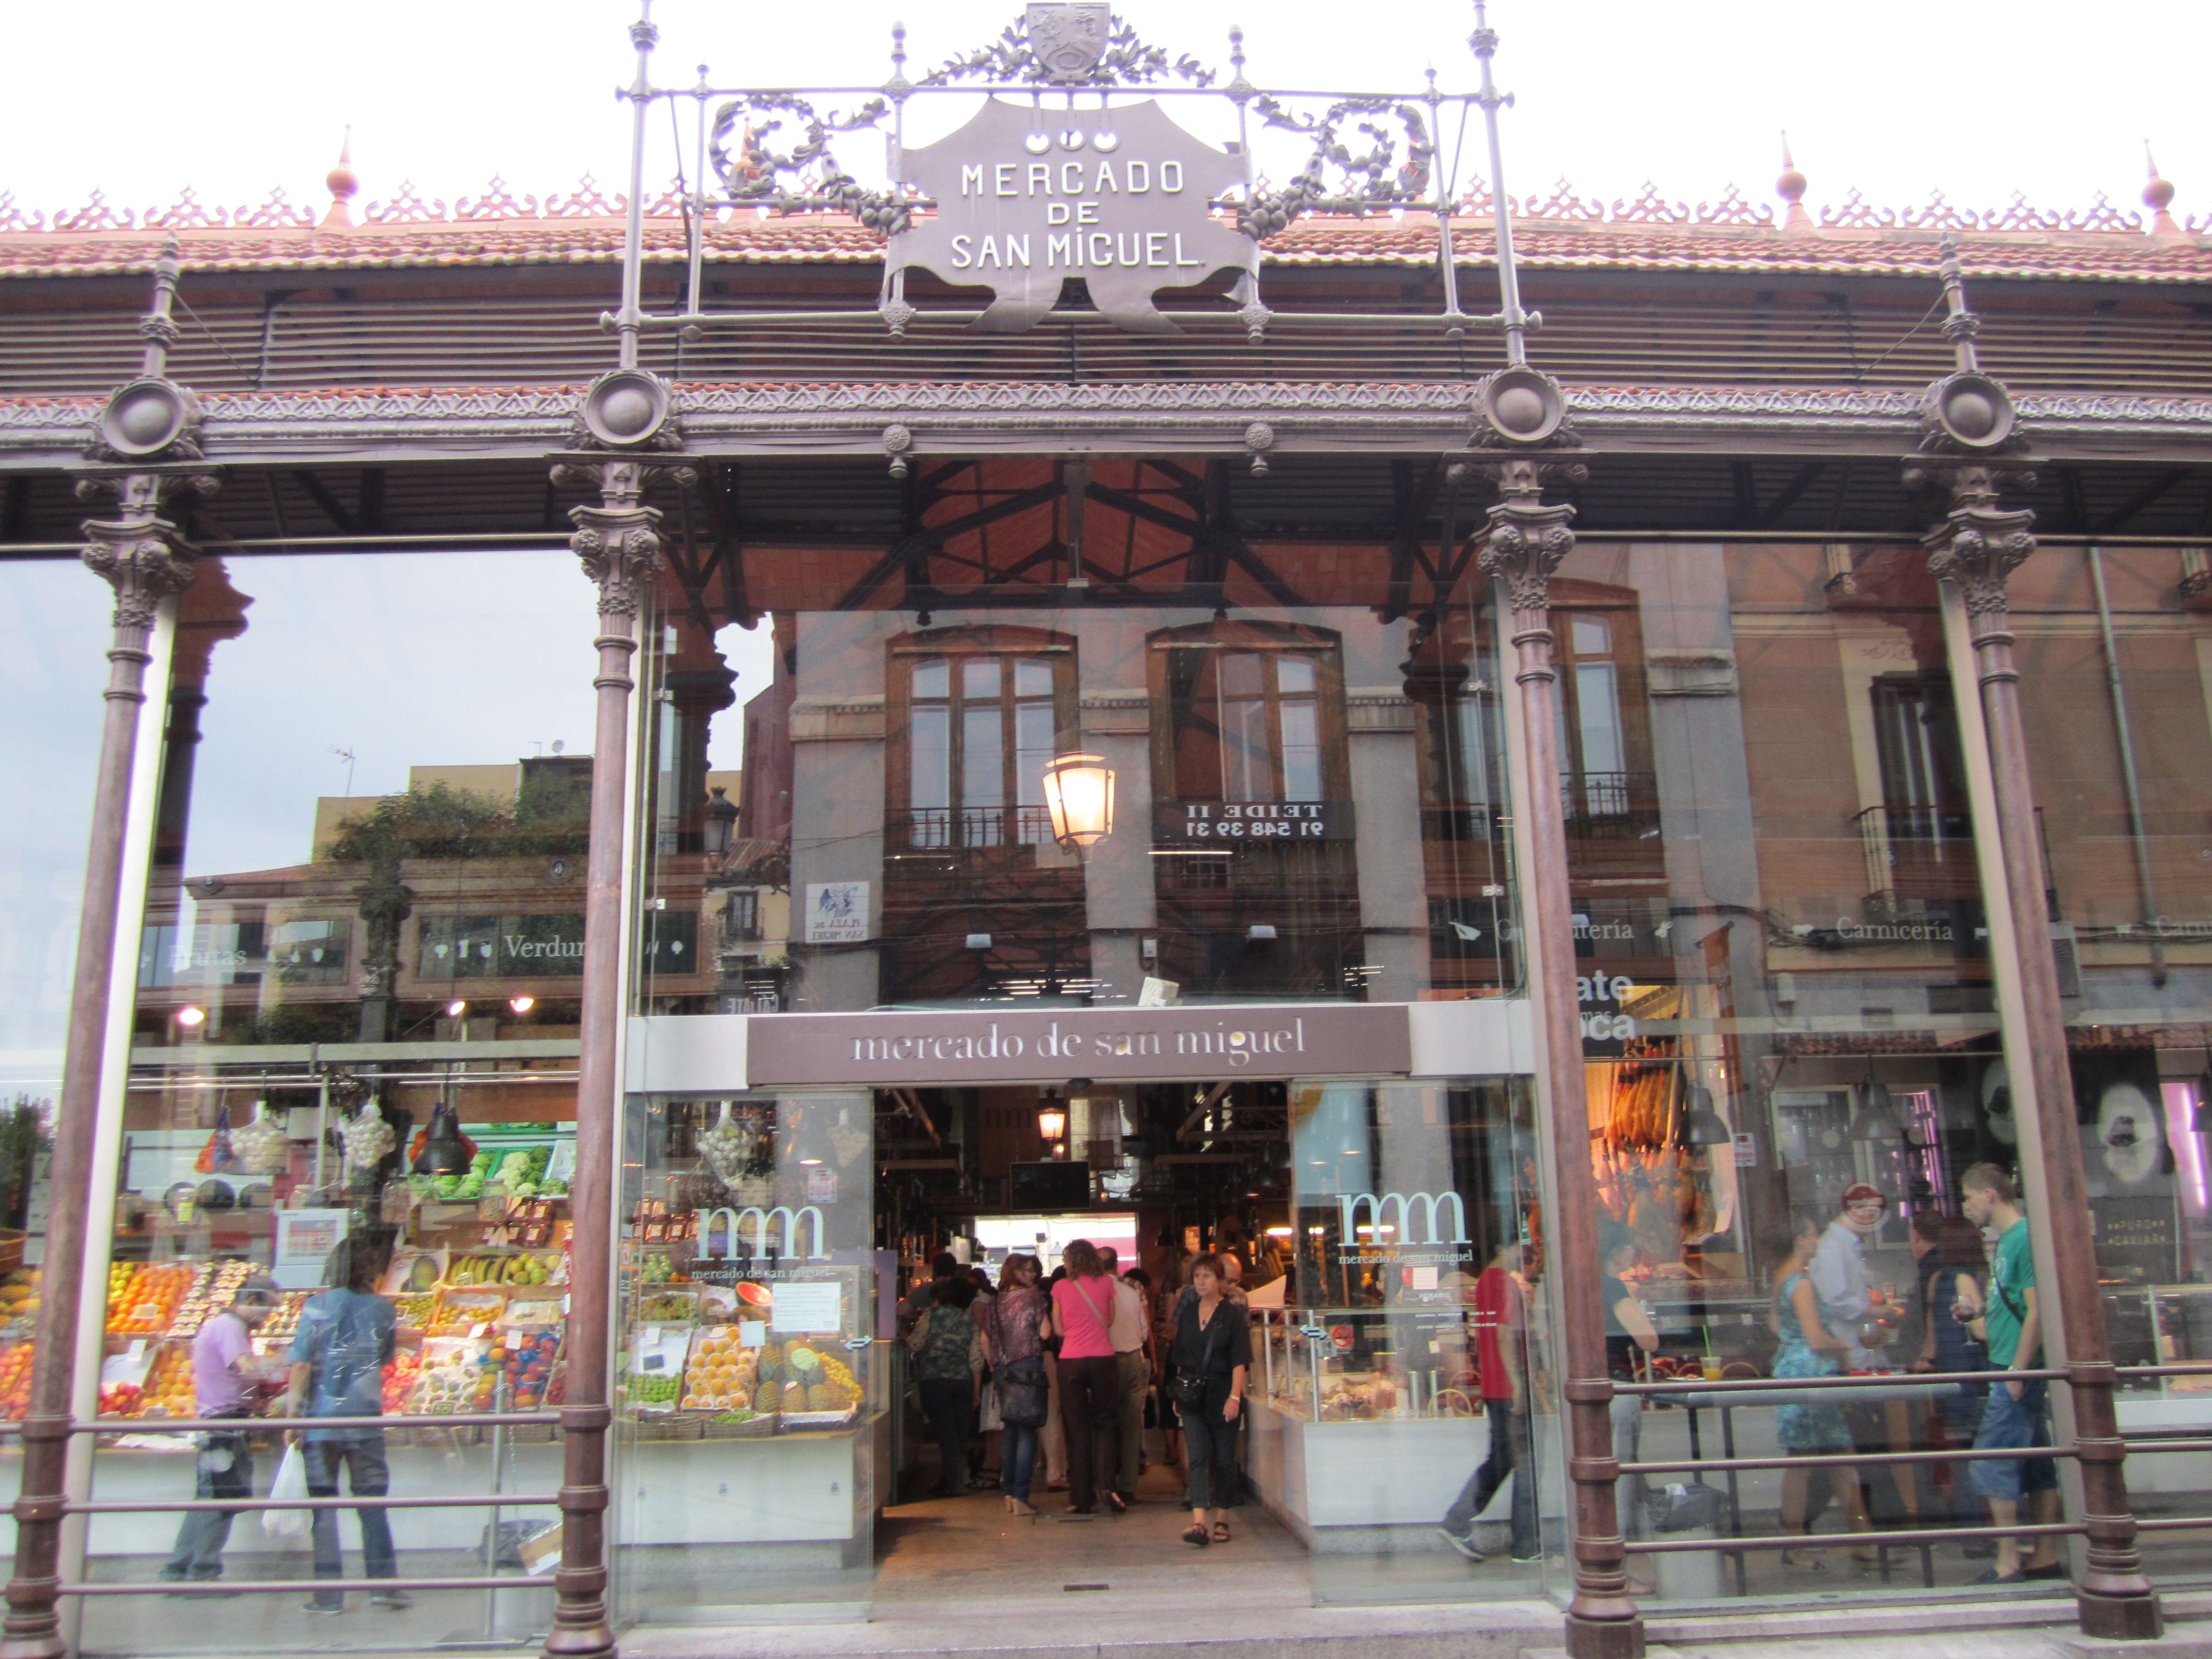 Mercado de San Miguel, Madrid Places, Favorite places